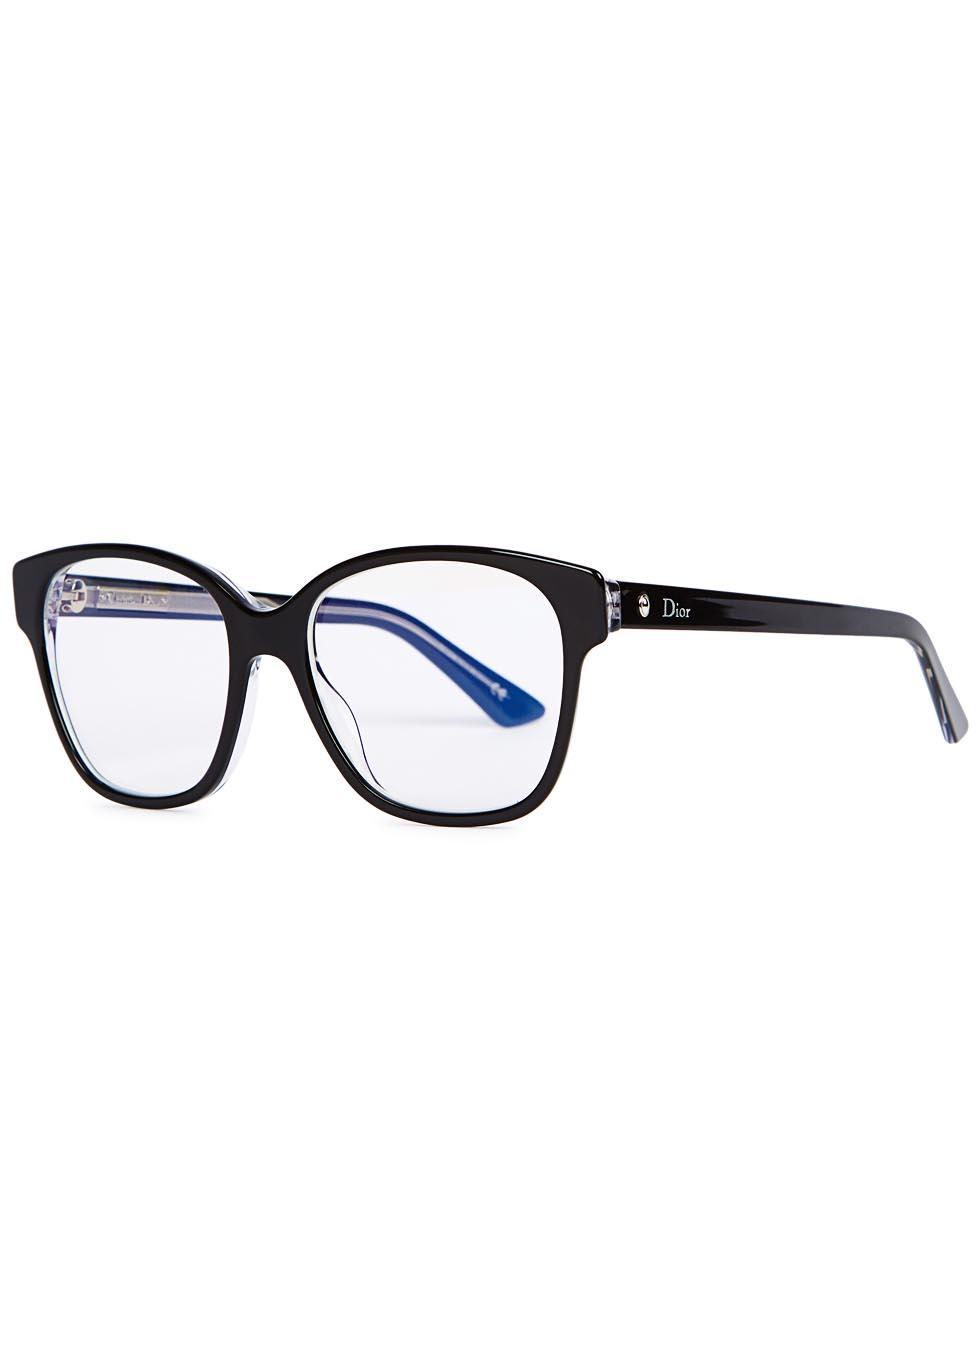 4d1a3d9623 Dior Montaigne 8 Black Optical Glasses in Blue - Lyst